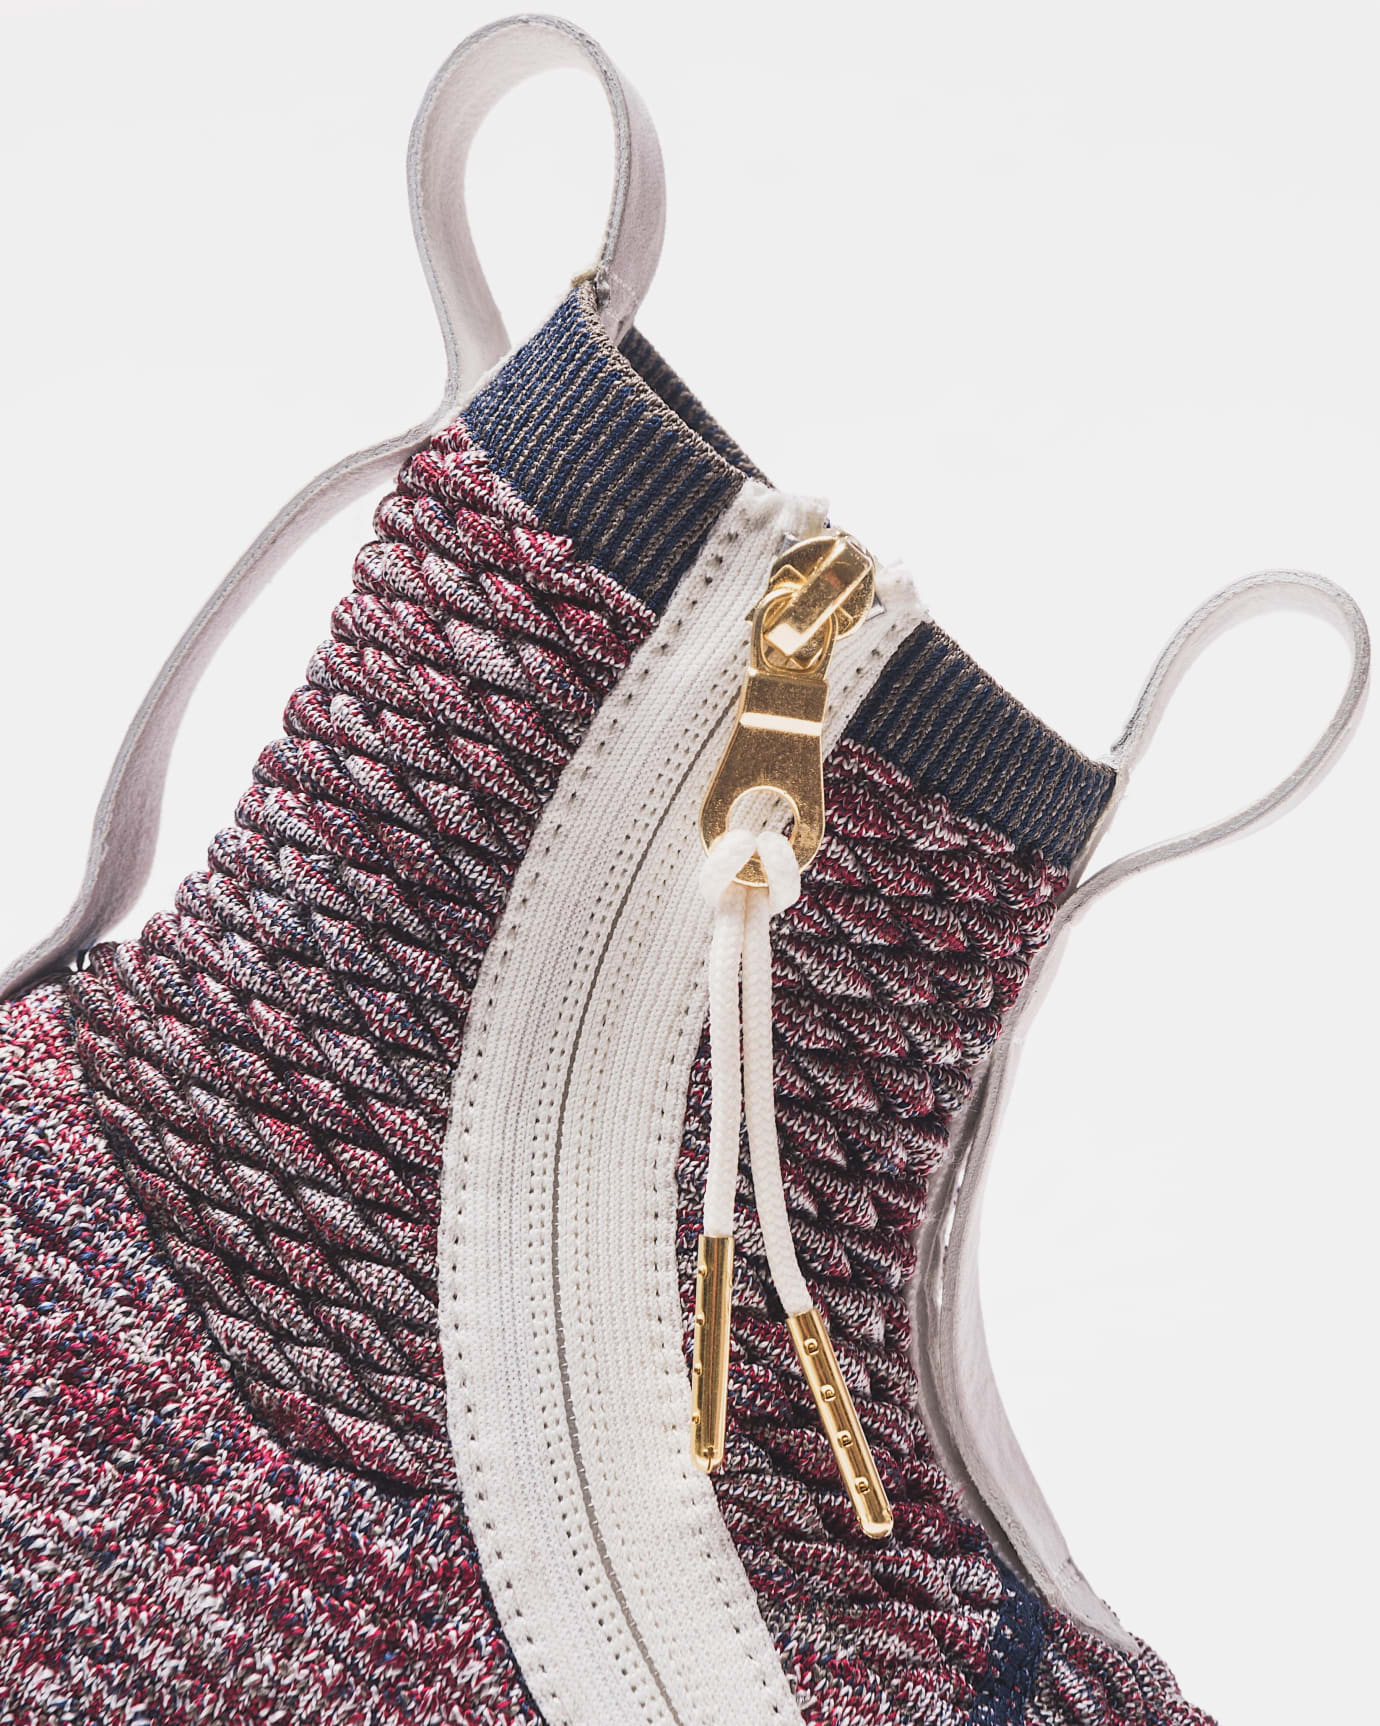 Kith Nike LeBron 15 Ronnie Fieg 3